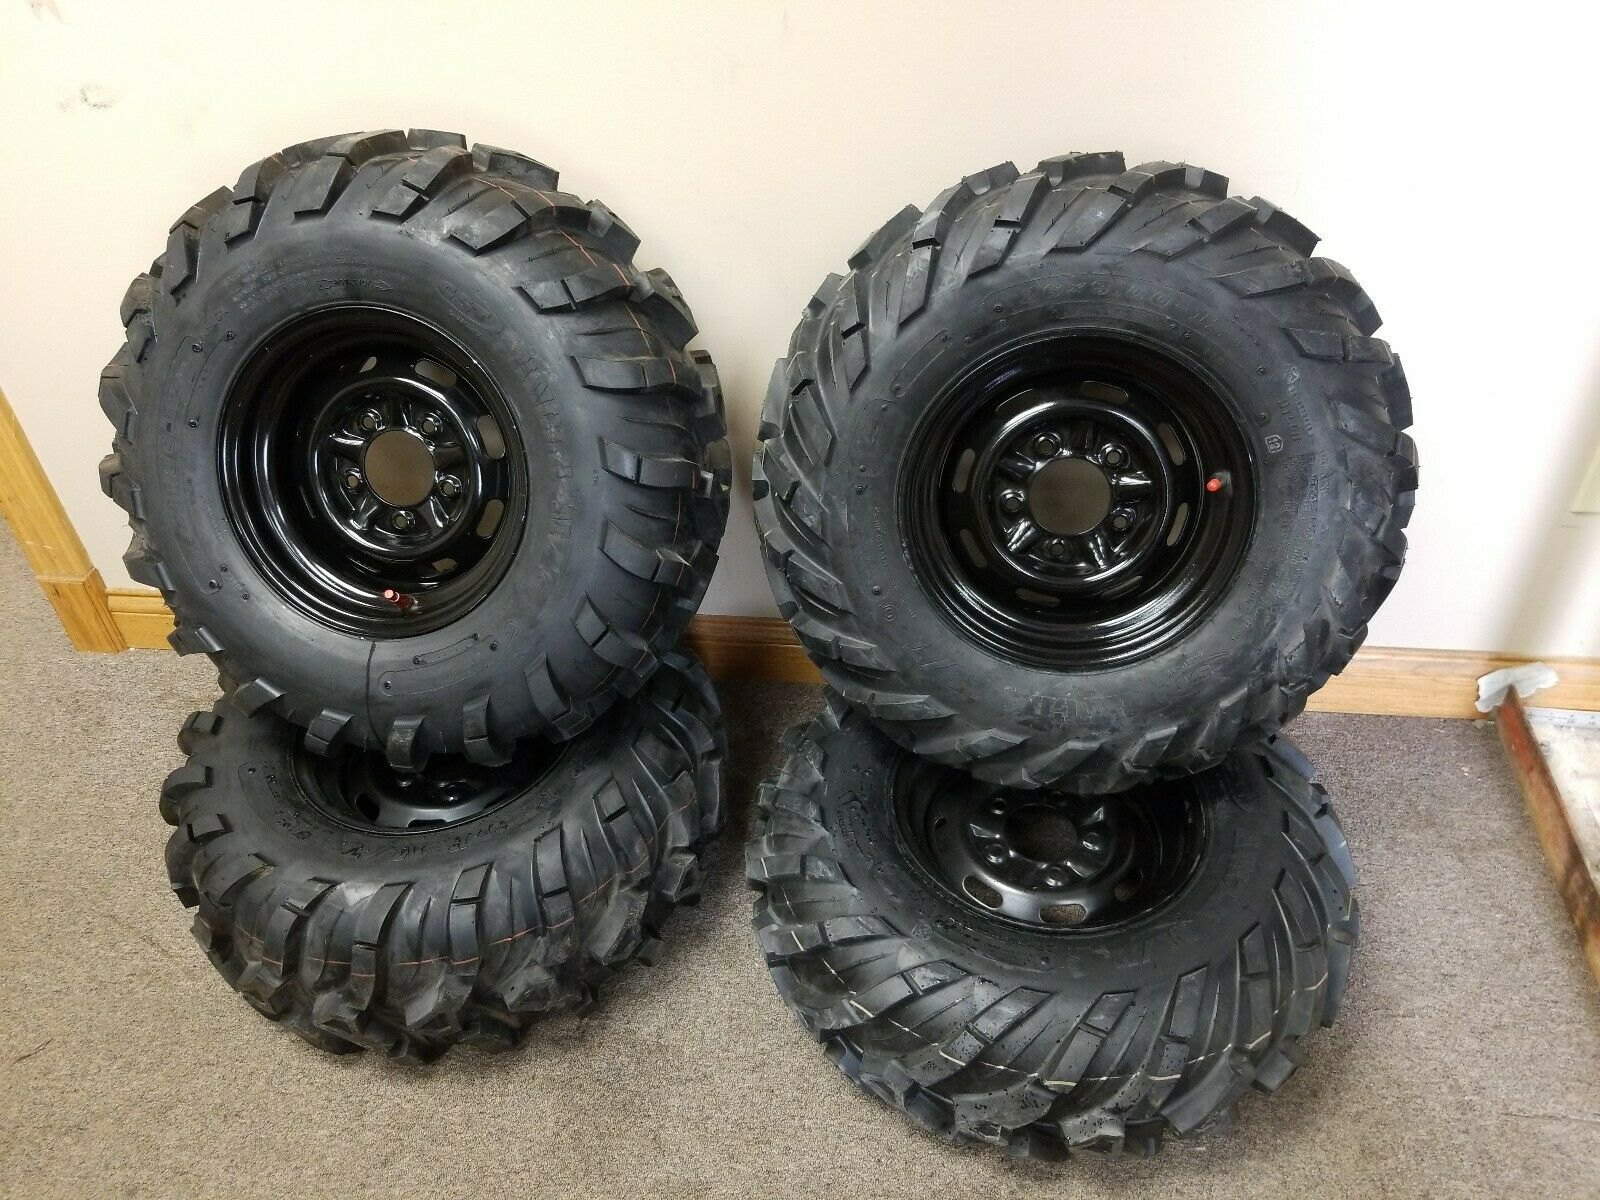 Conjunto de 4 Ejecutar Flat 26X11.00-12 - 26X9.00-12 John Deere Gator Wheels & Tires